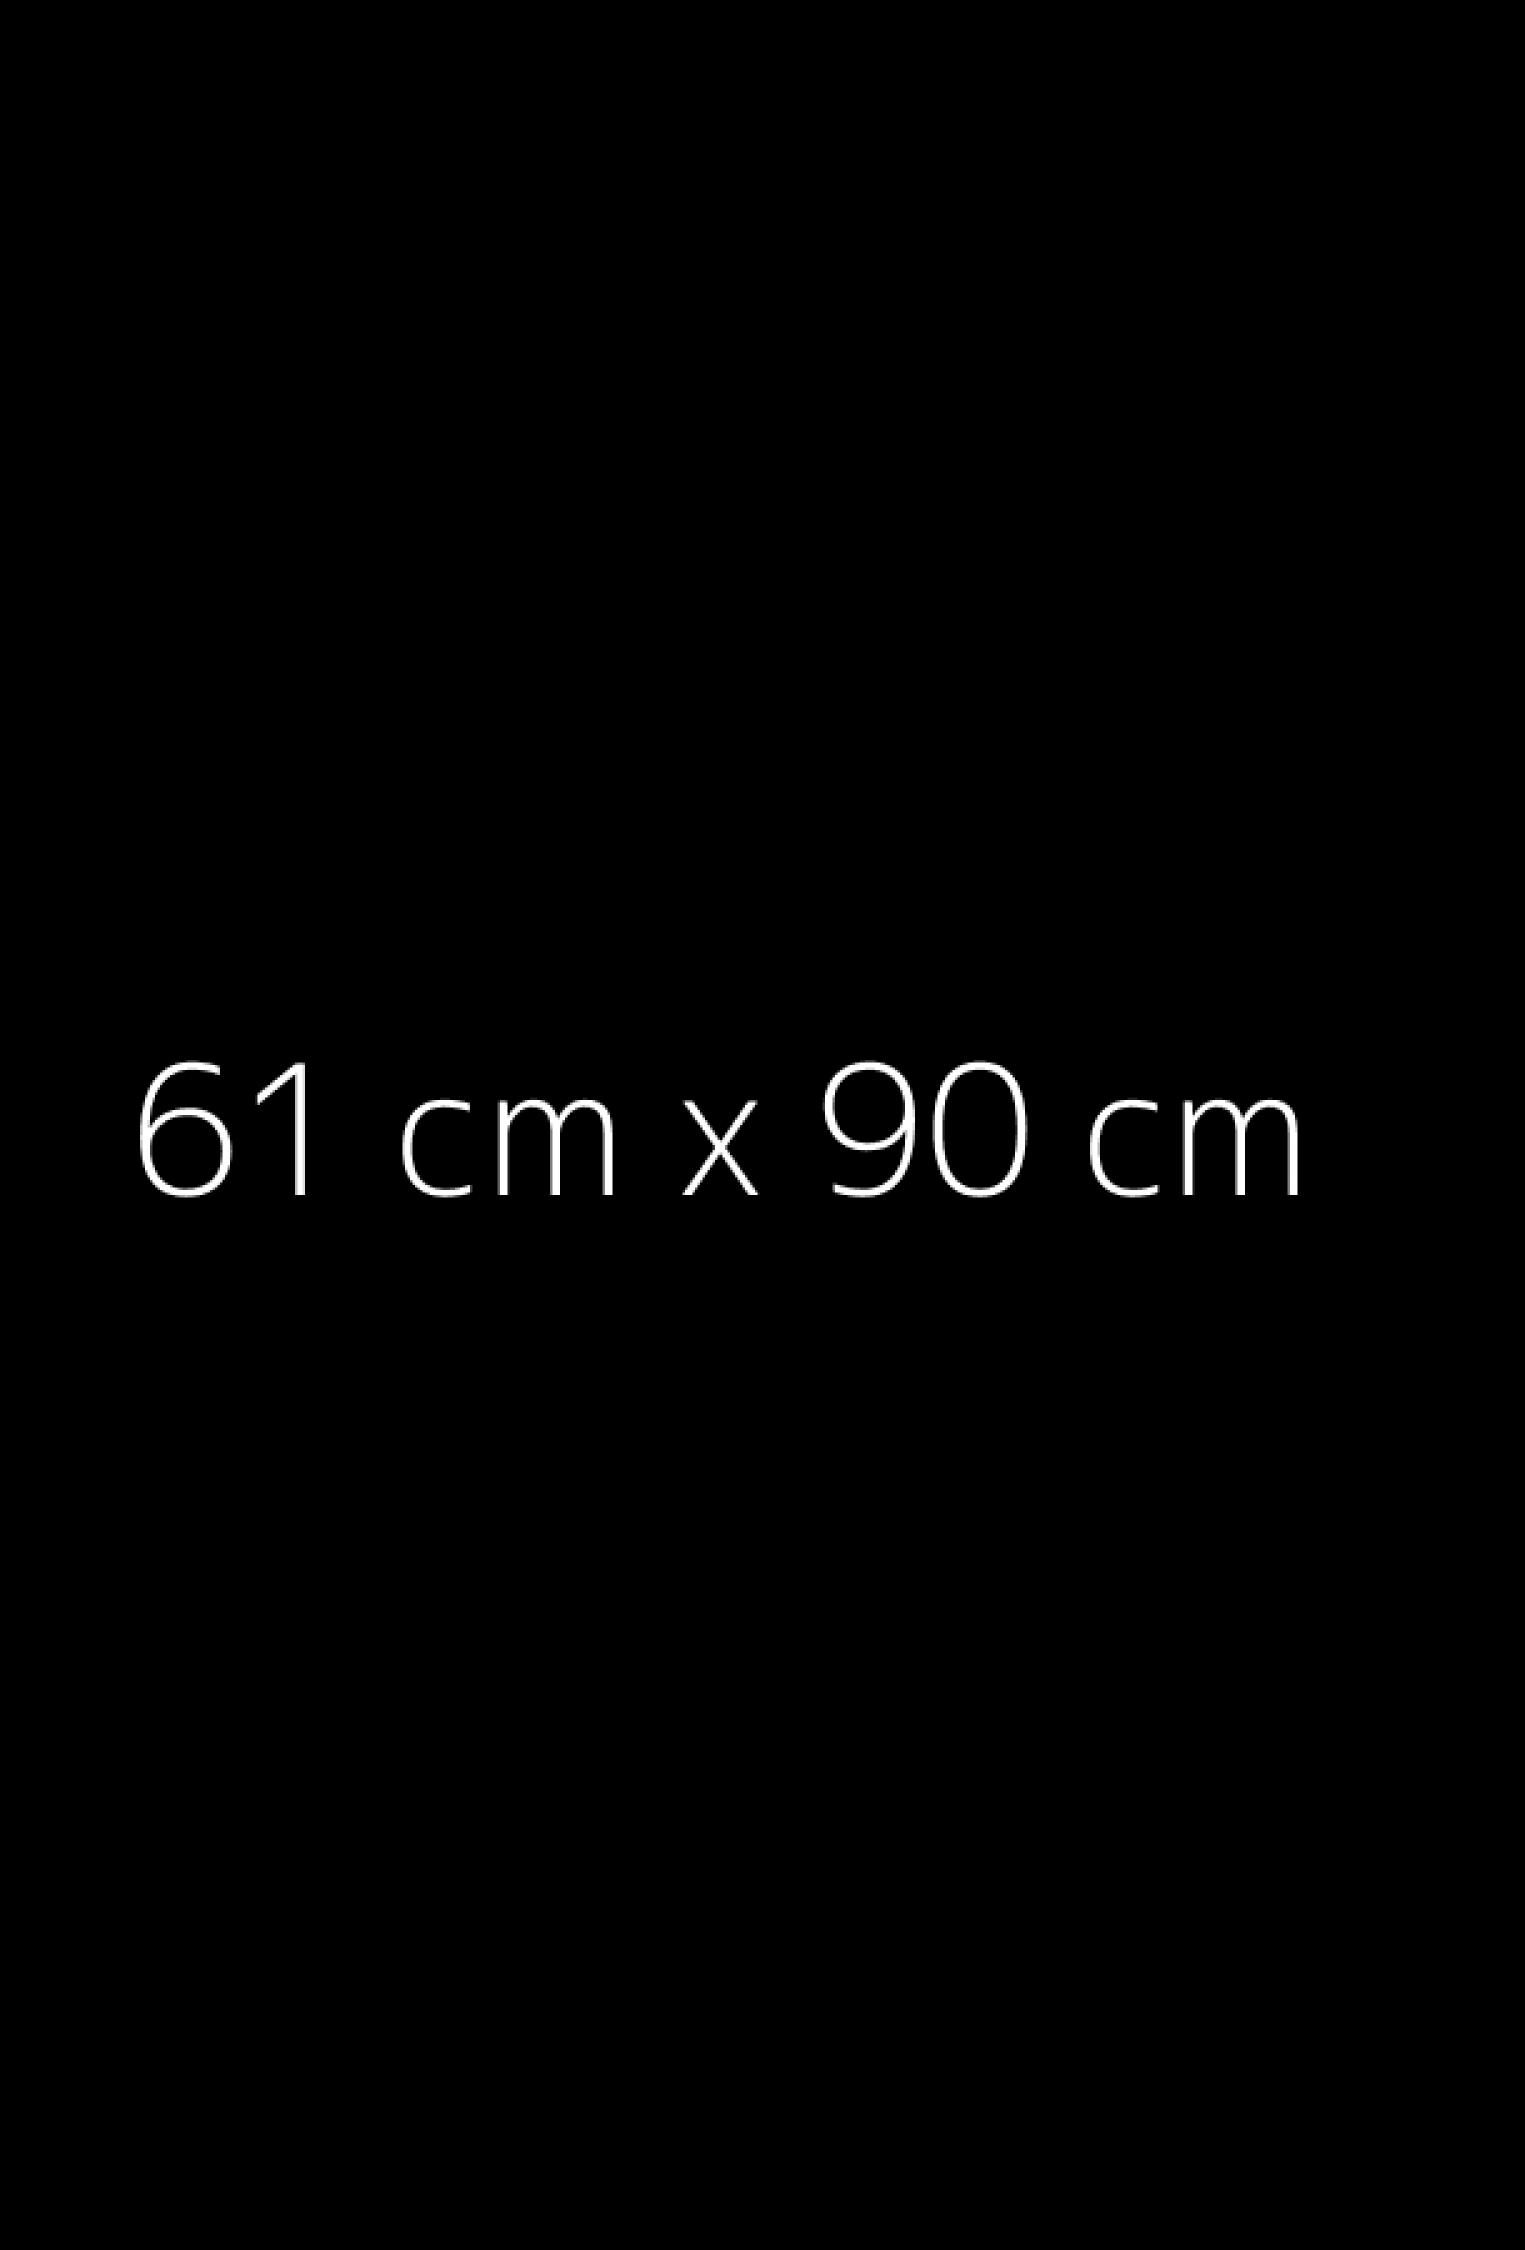 Reprodukcje format 61x90